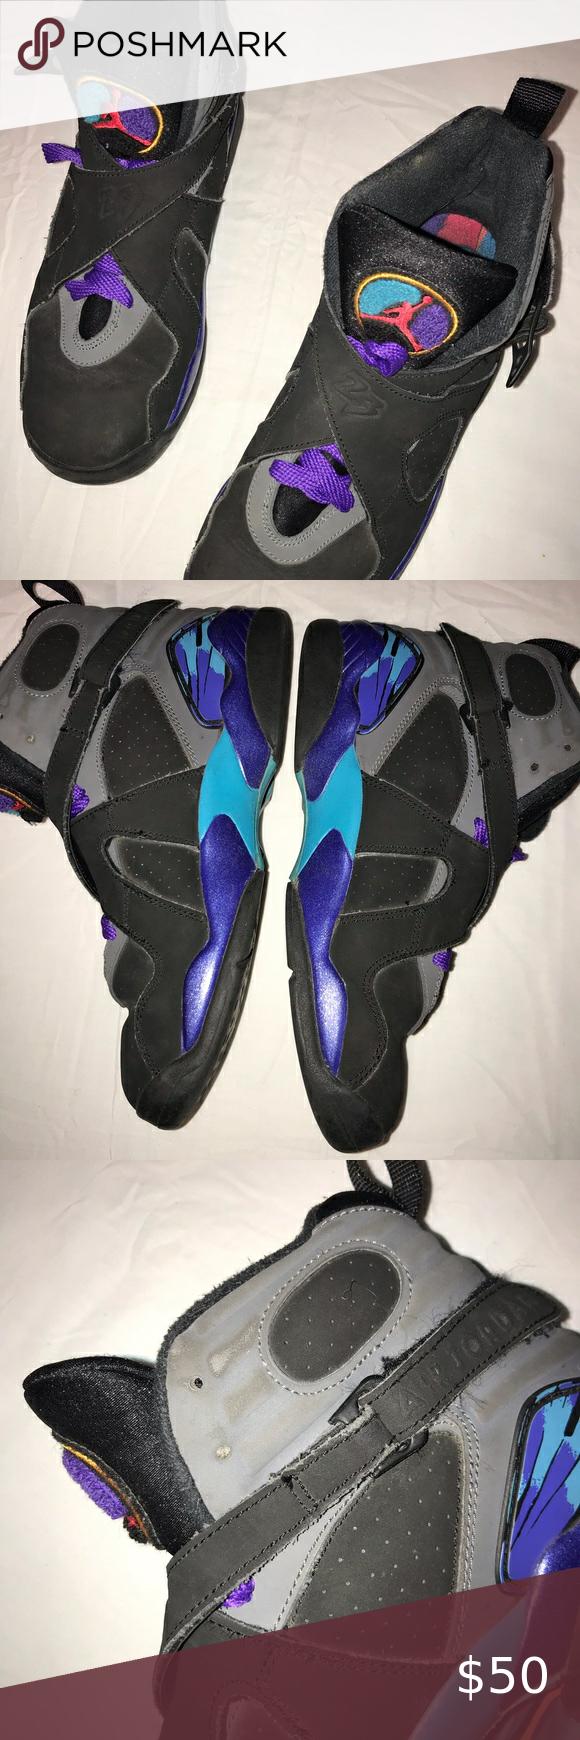 Air Jordan Retro 8 Aqua size 7 youth in